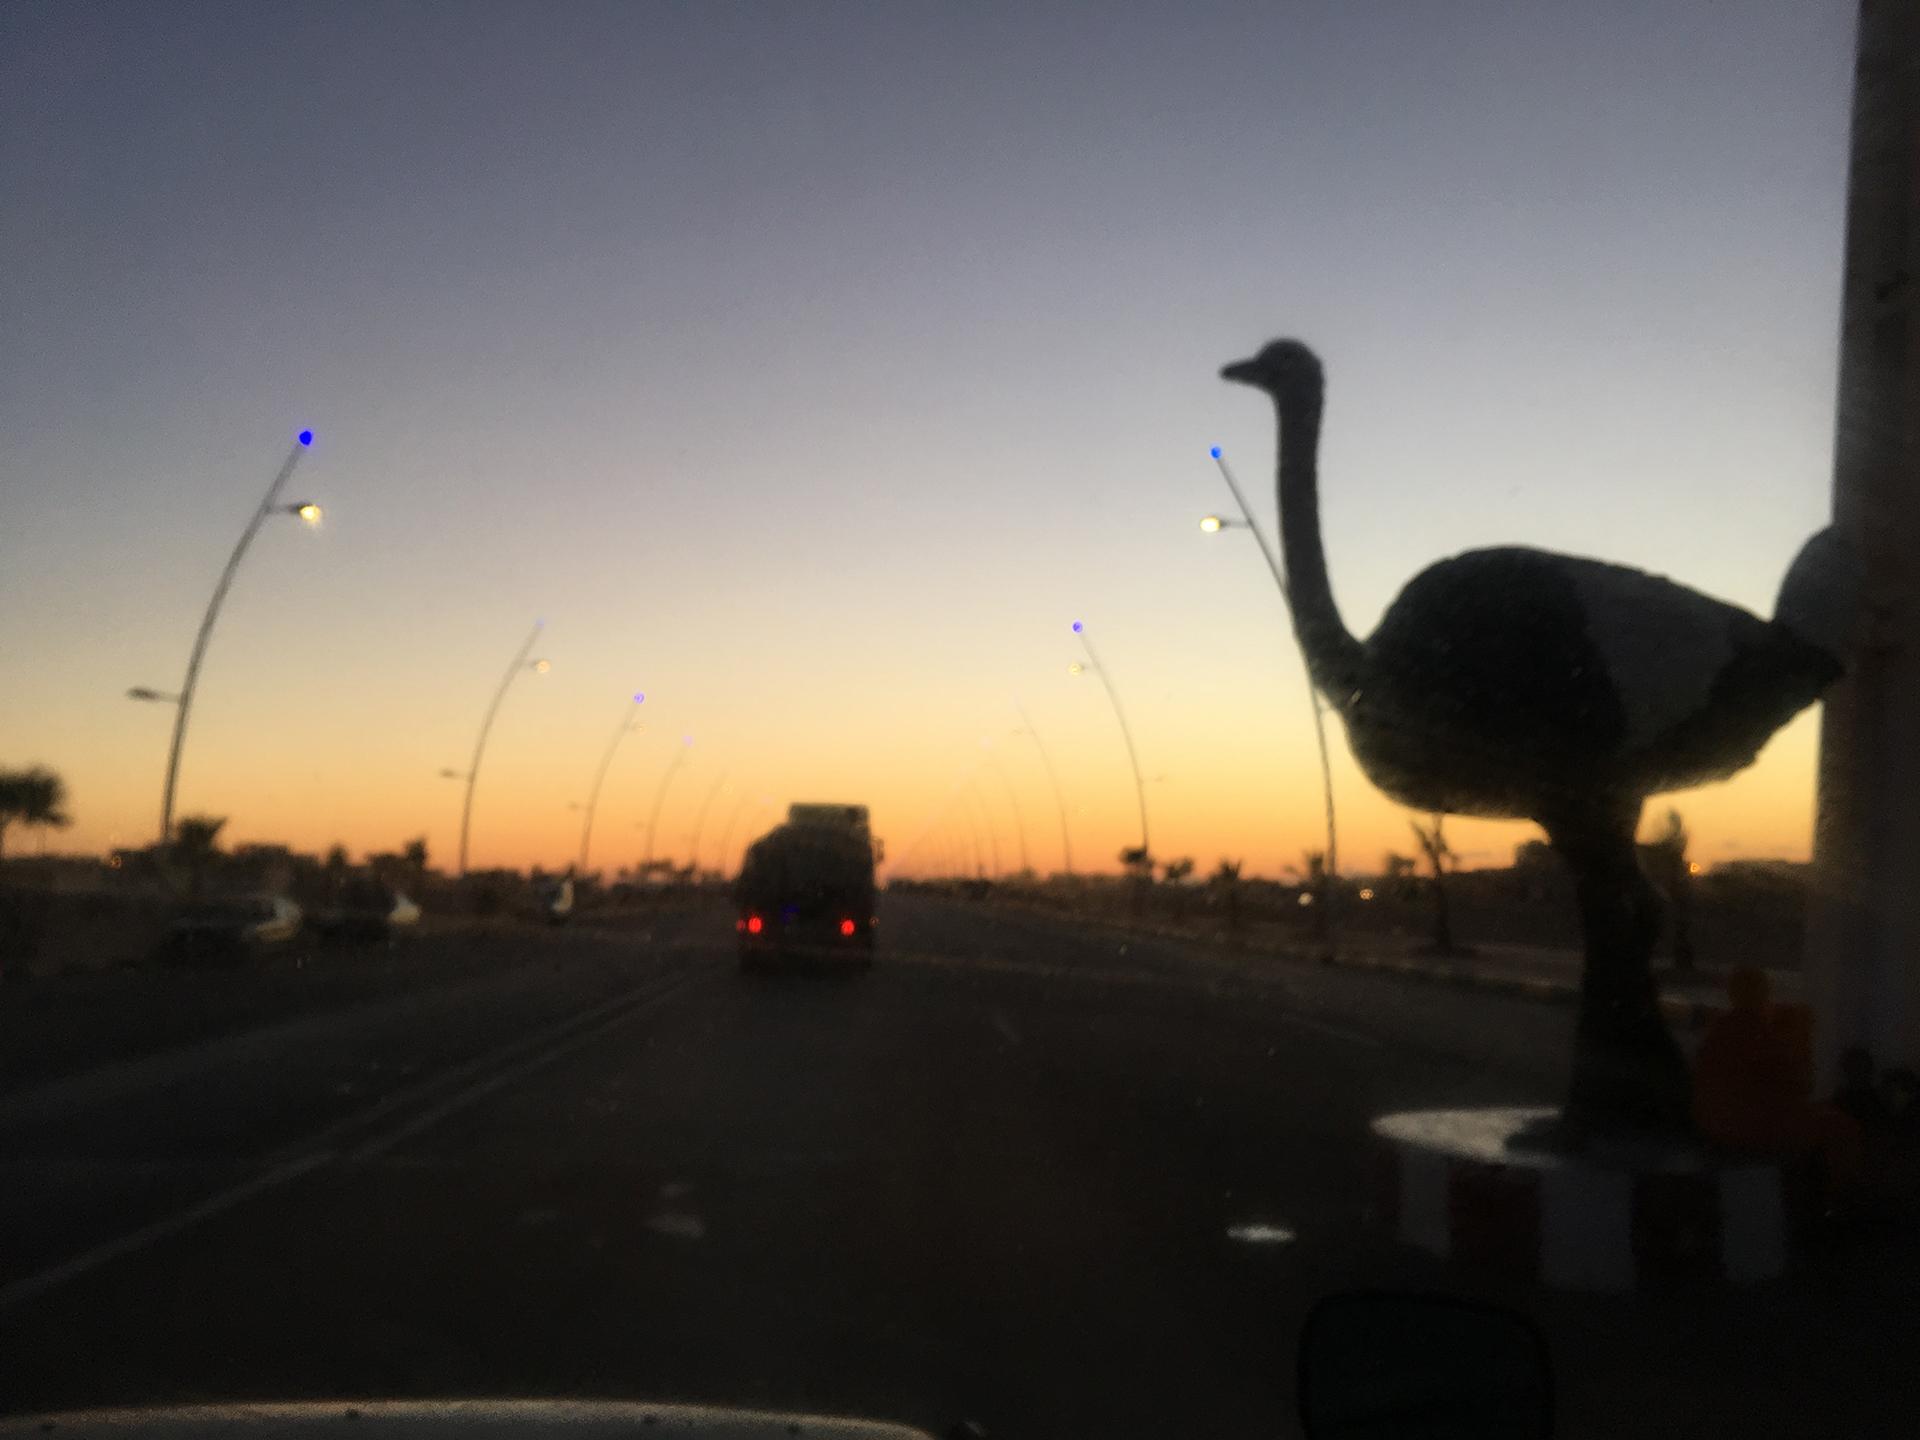 avestruz marruecos pablocaminante 1 - Marruecos 2/3, Sáhara Occidental